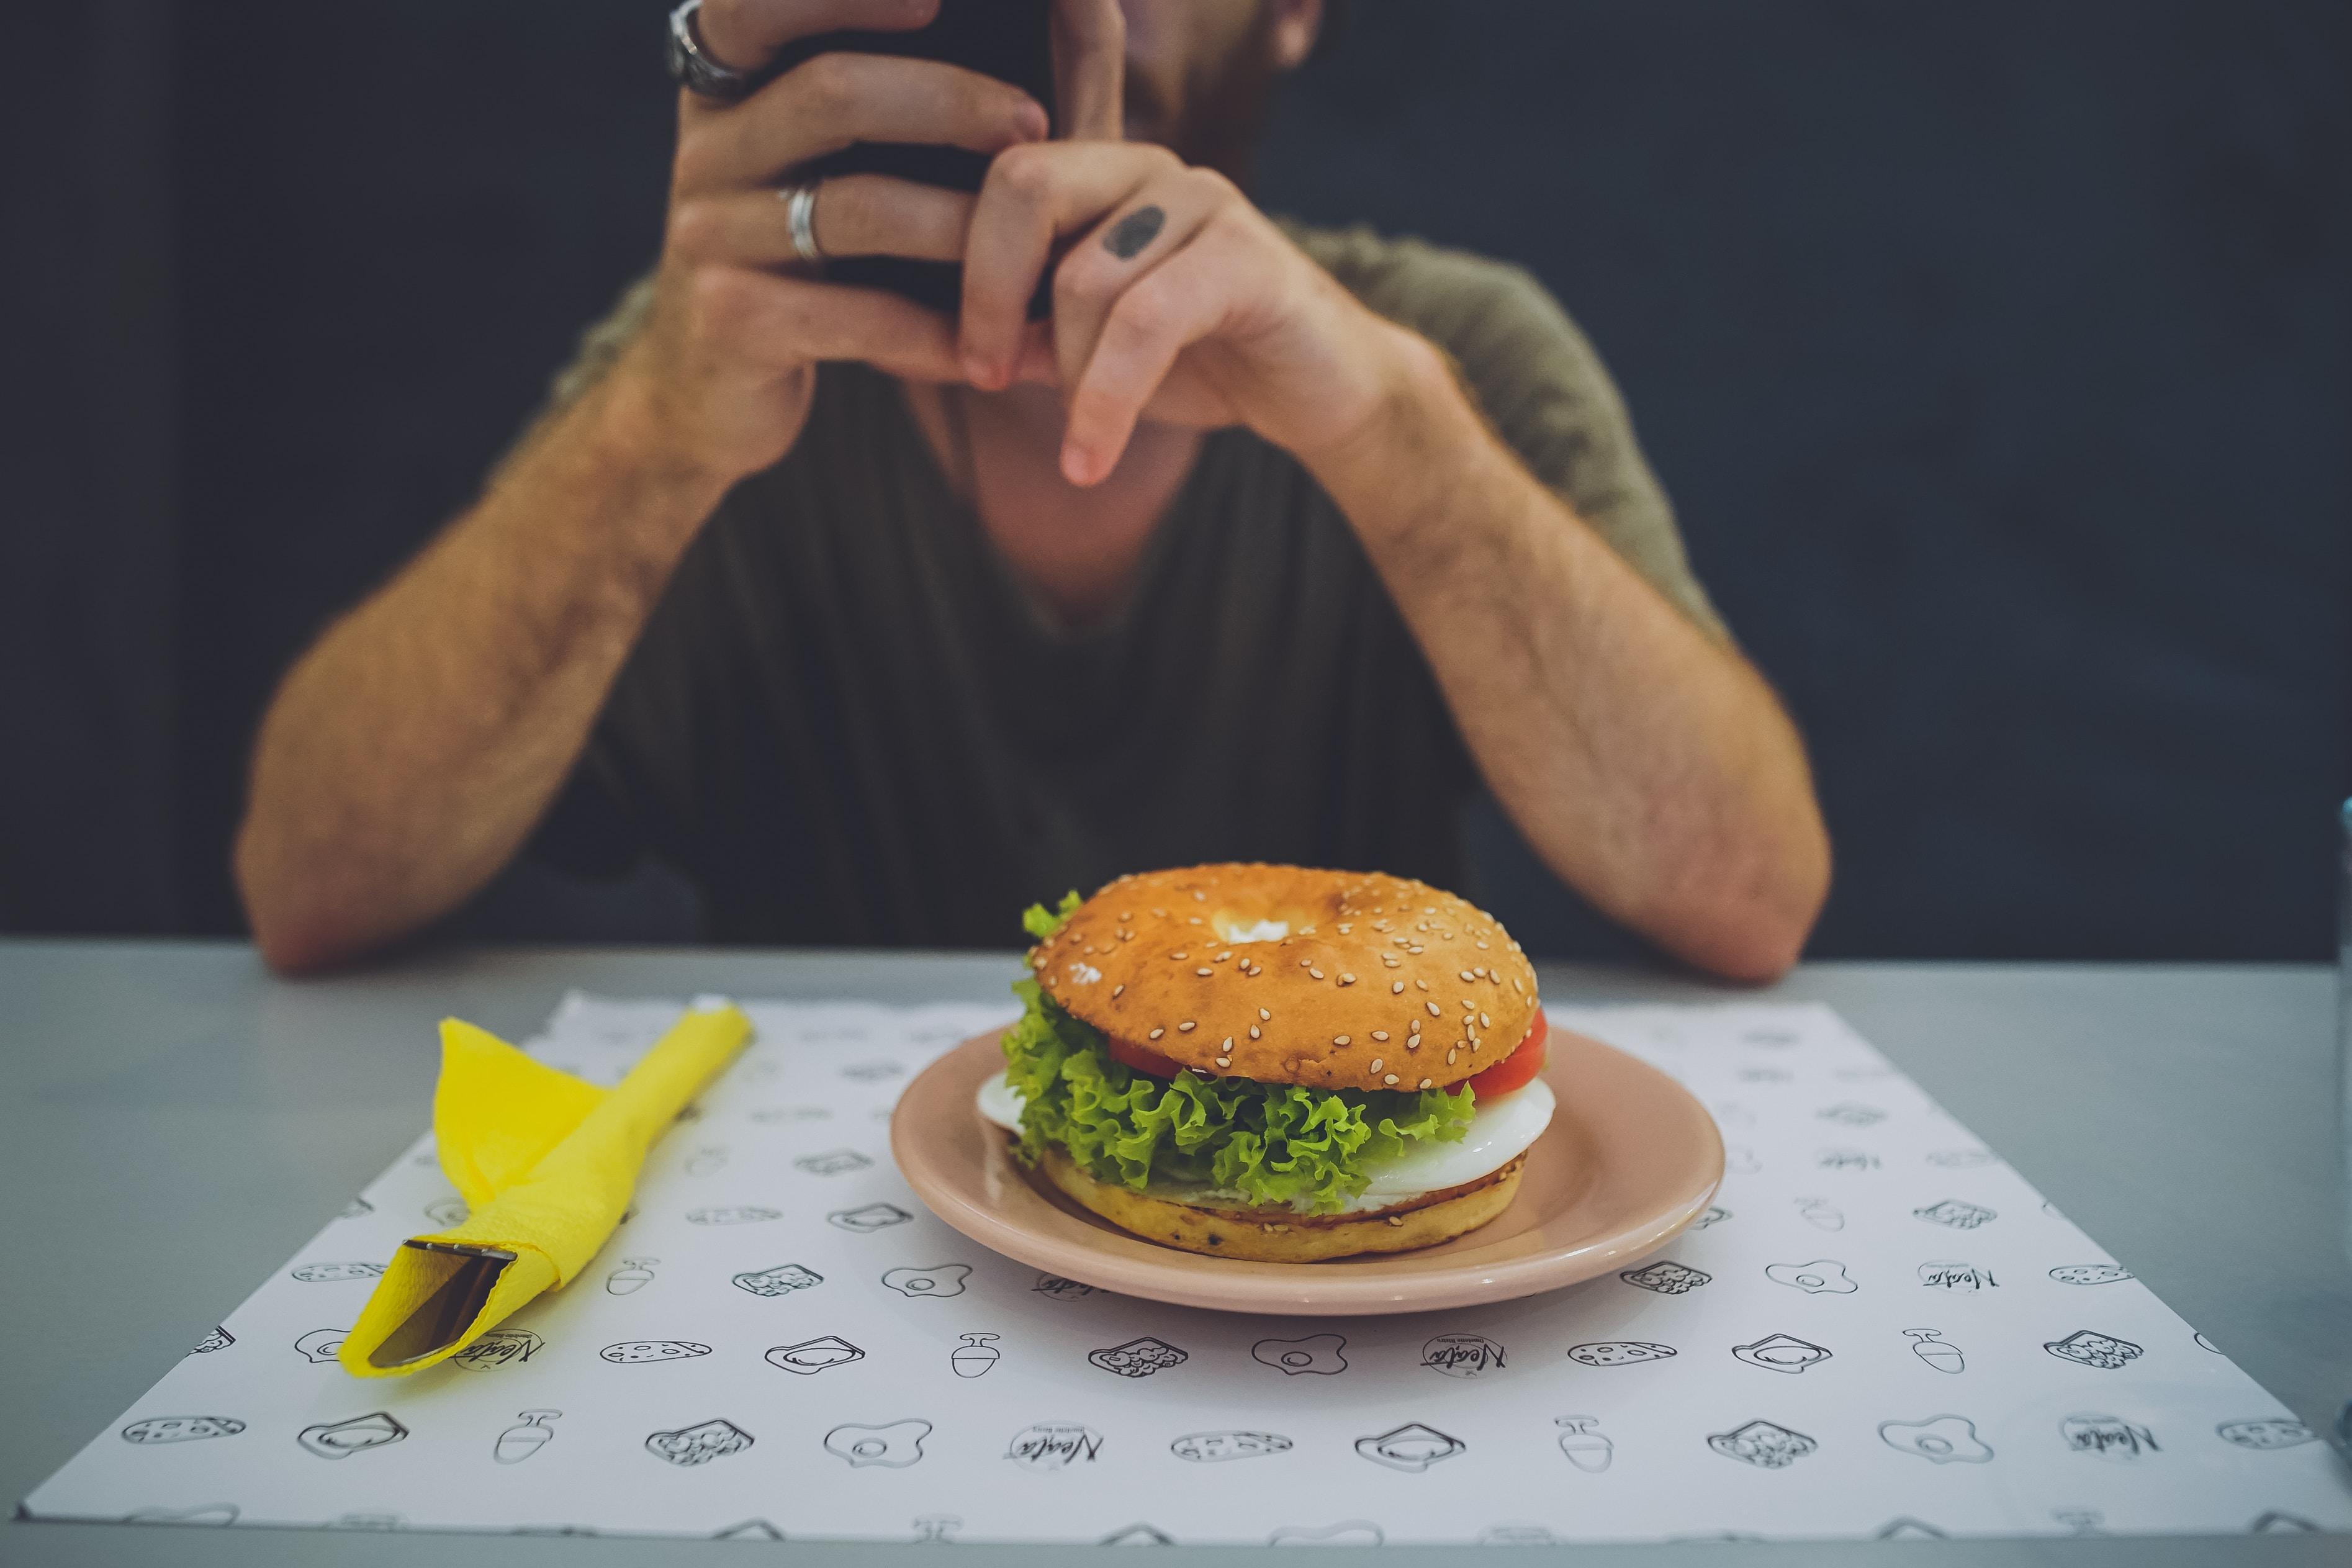 hamburger on saucer plate